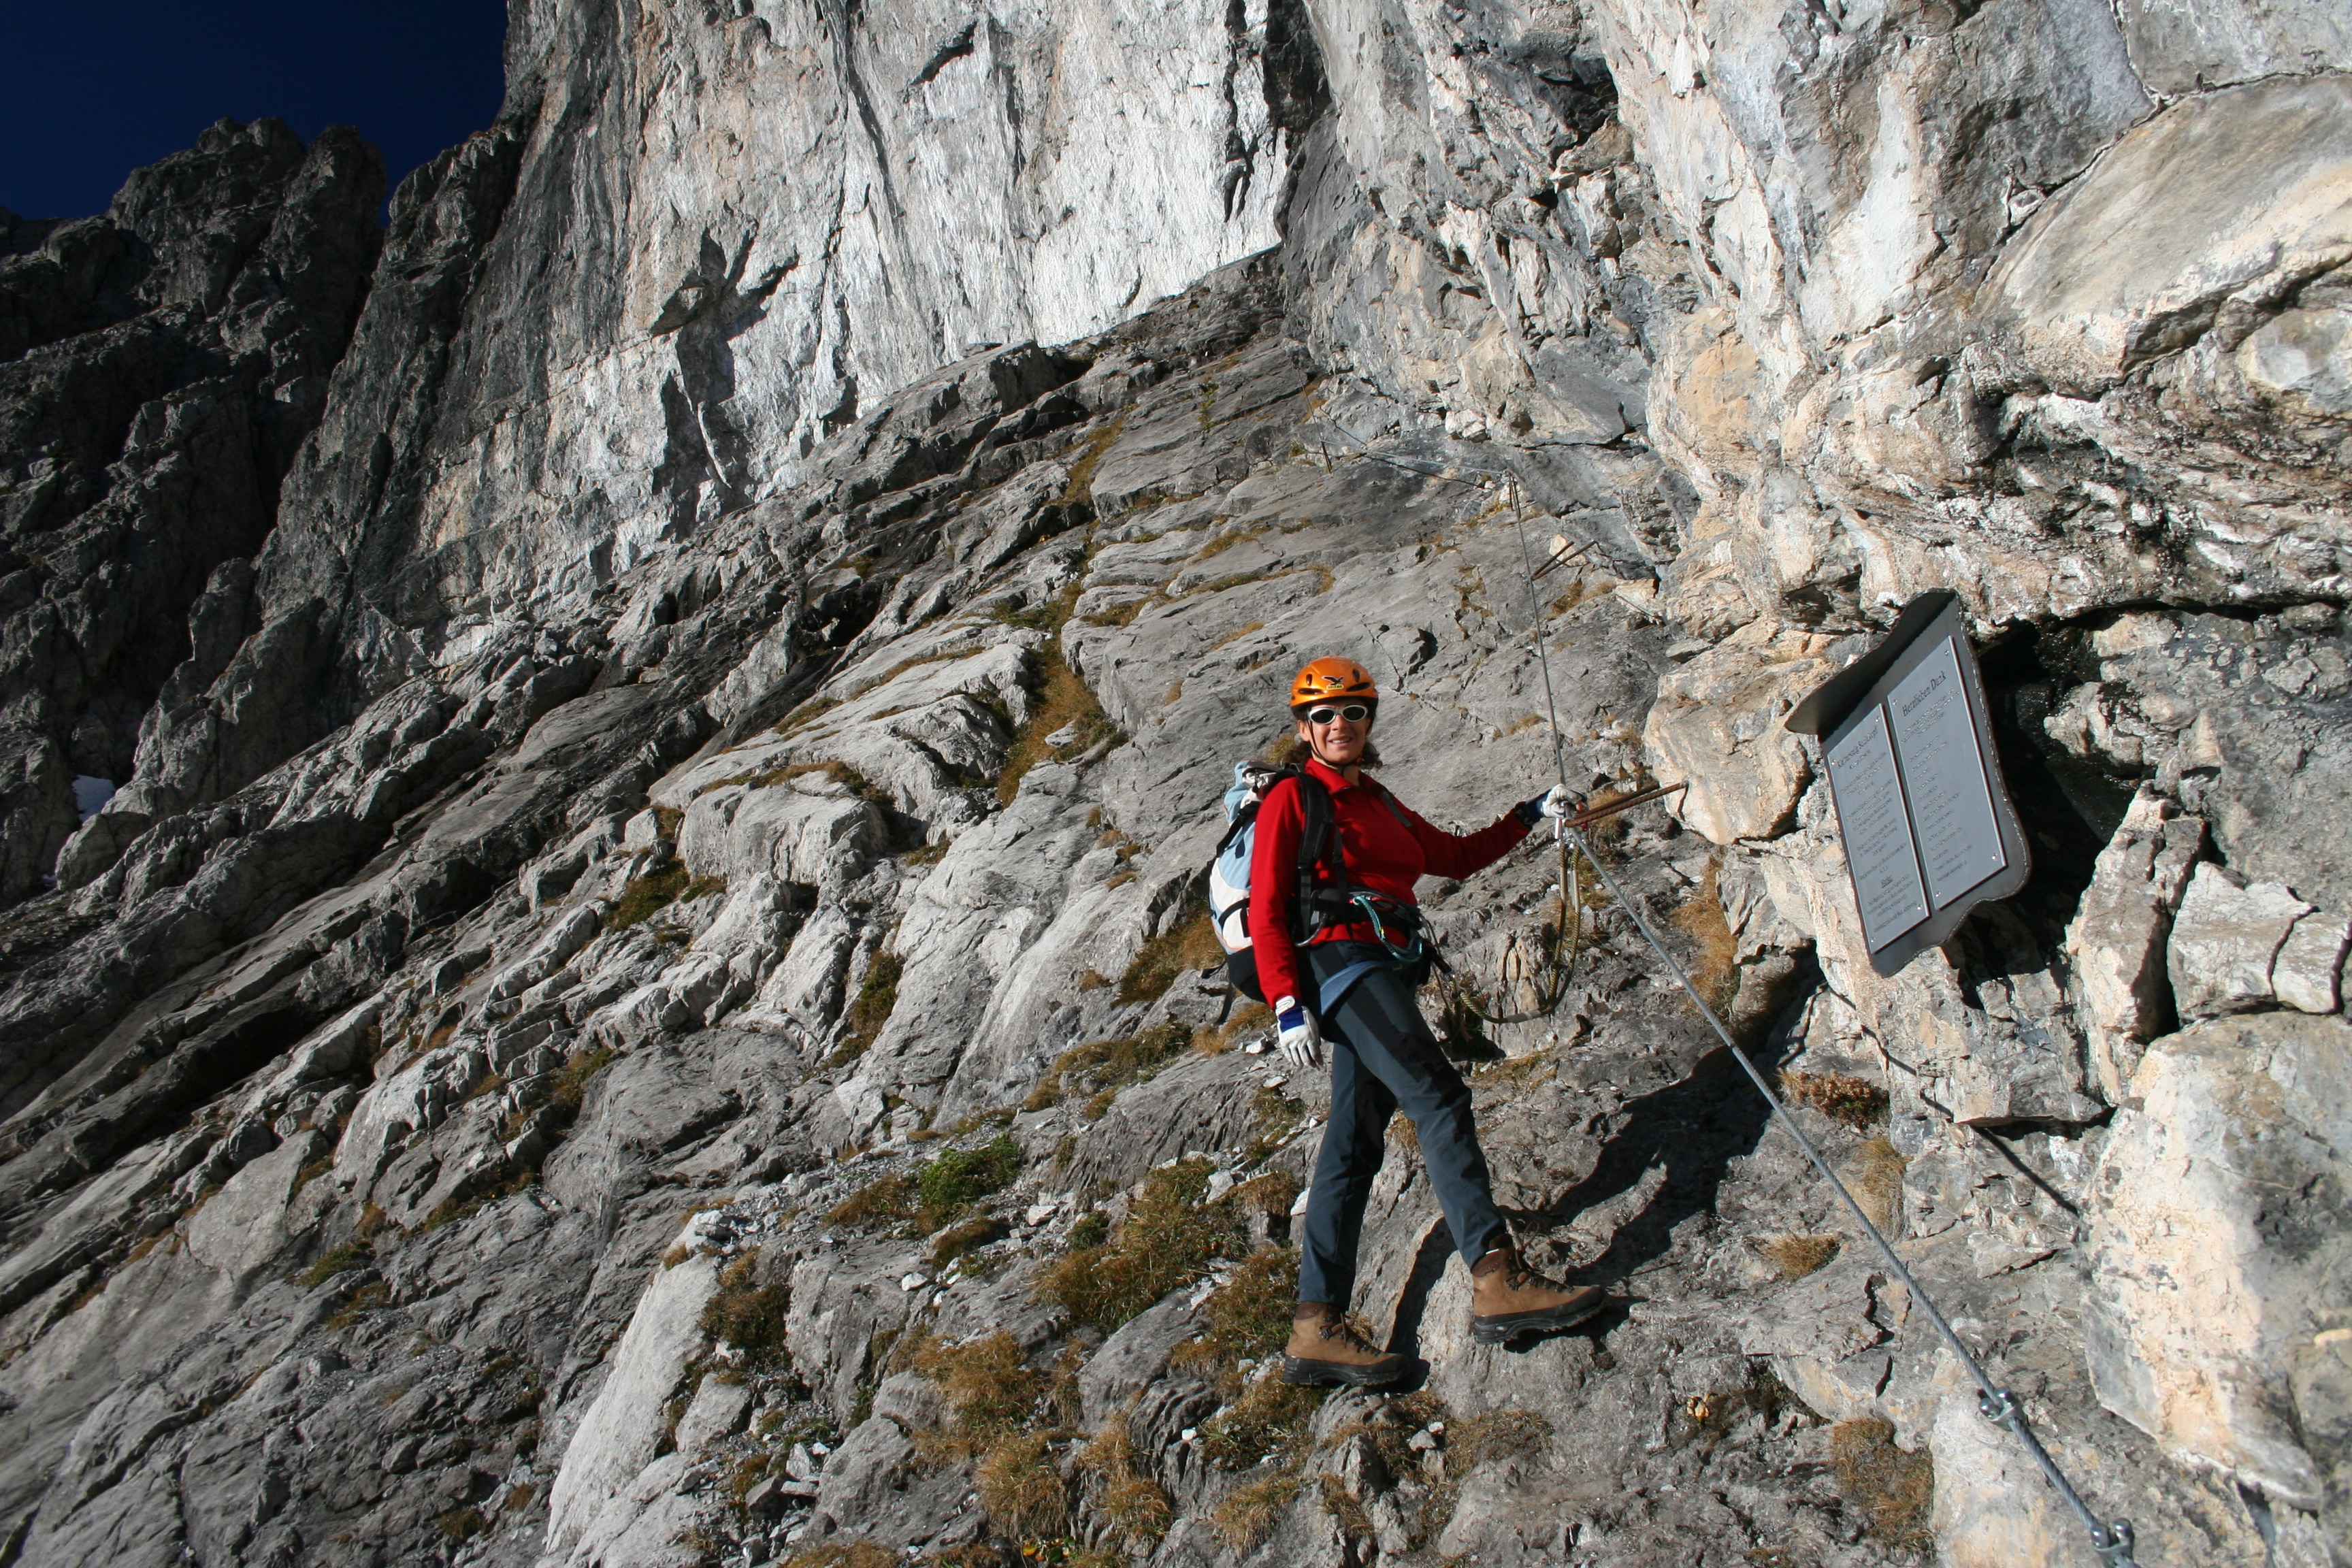 Klettersteig Basel : Klettersteig chäligang engstligenalp bern aktivitäten